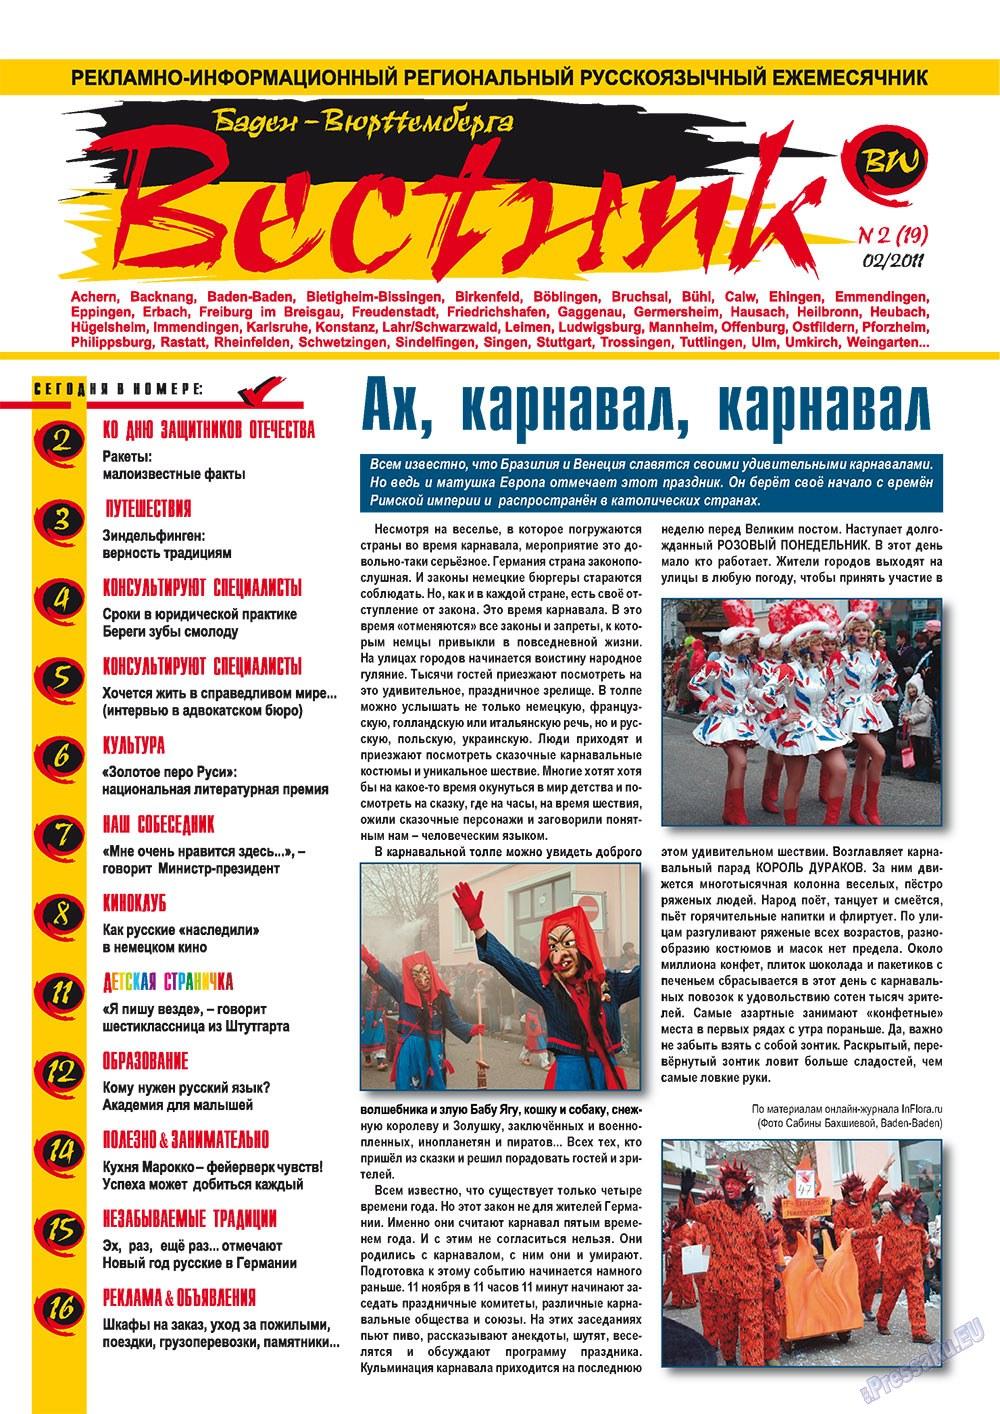 Вестник-info (журнал). 2011 год, номер 2, стр. 1